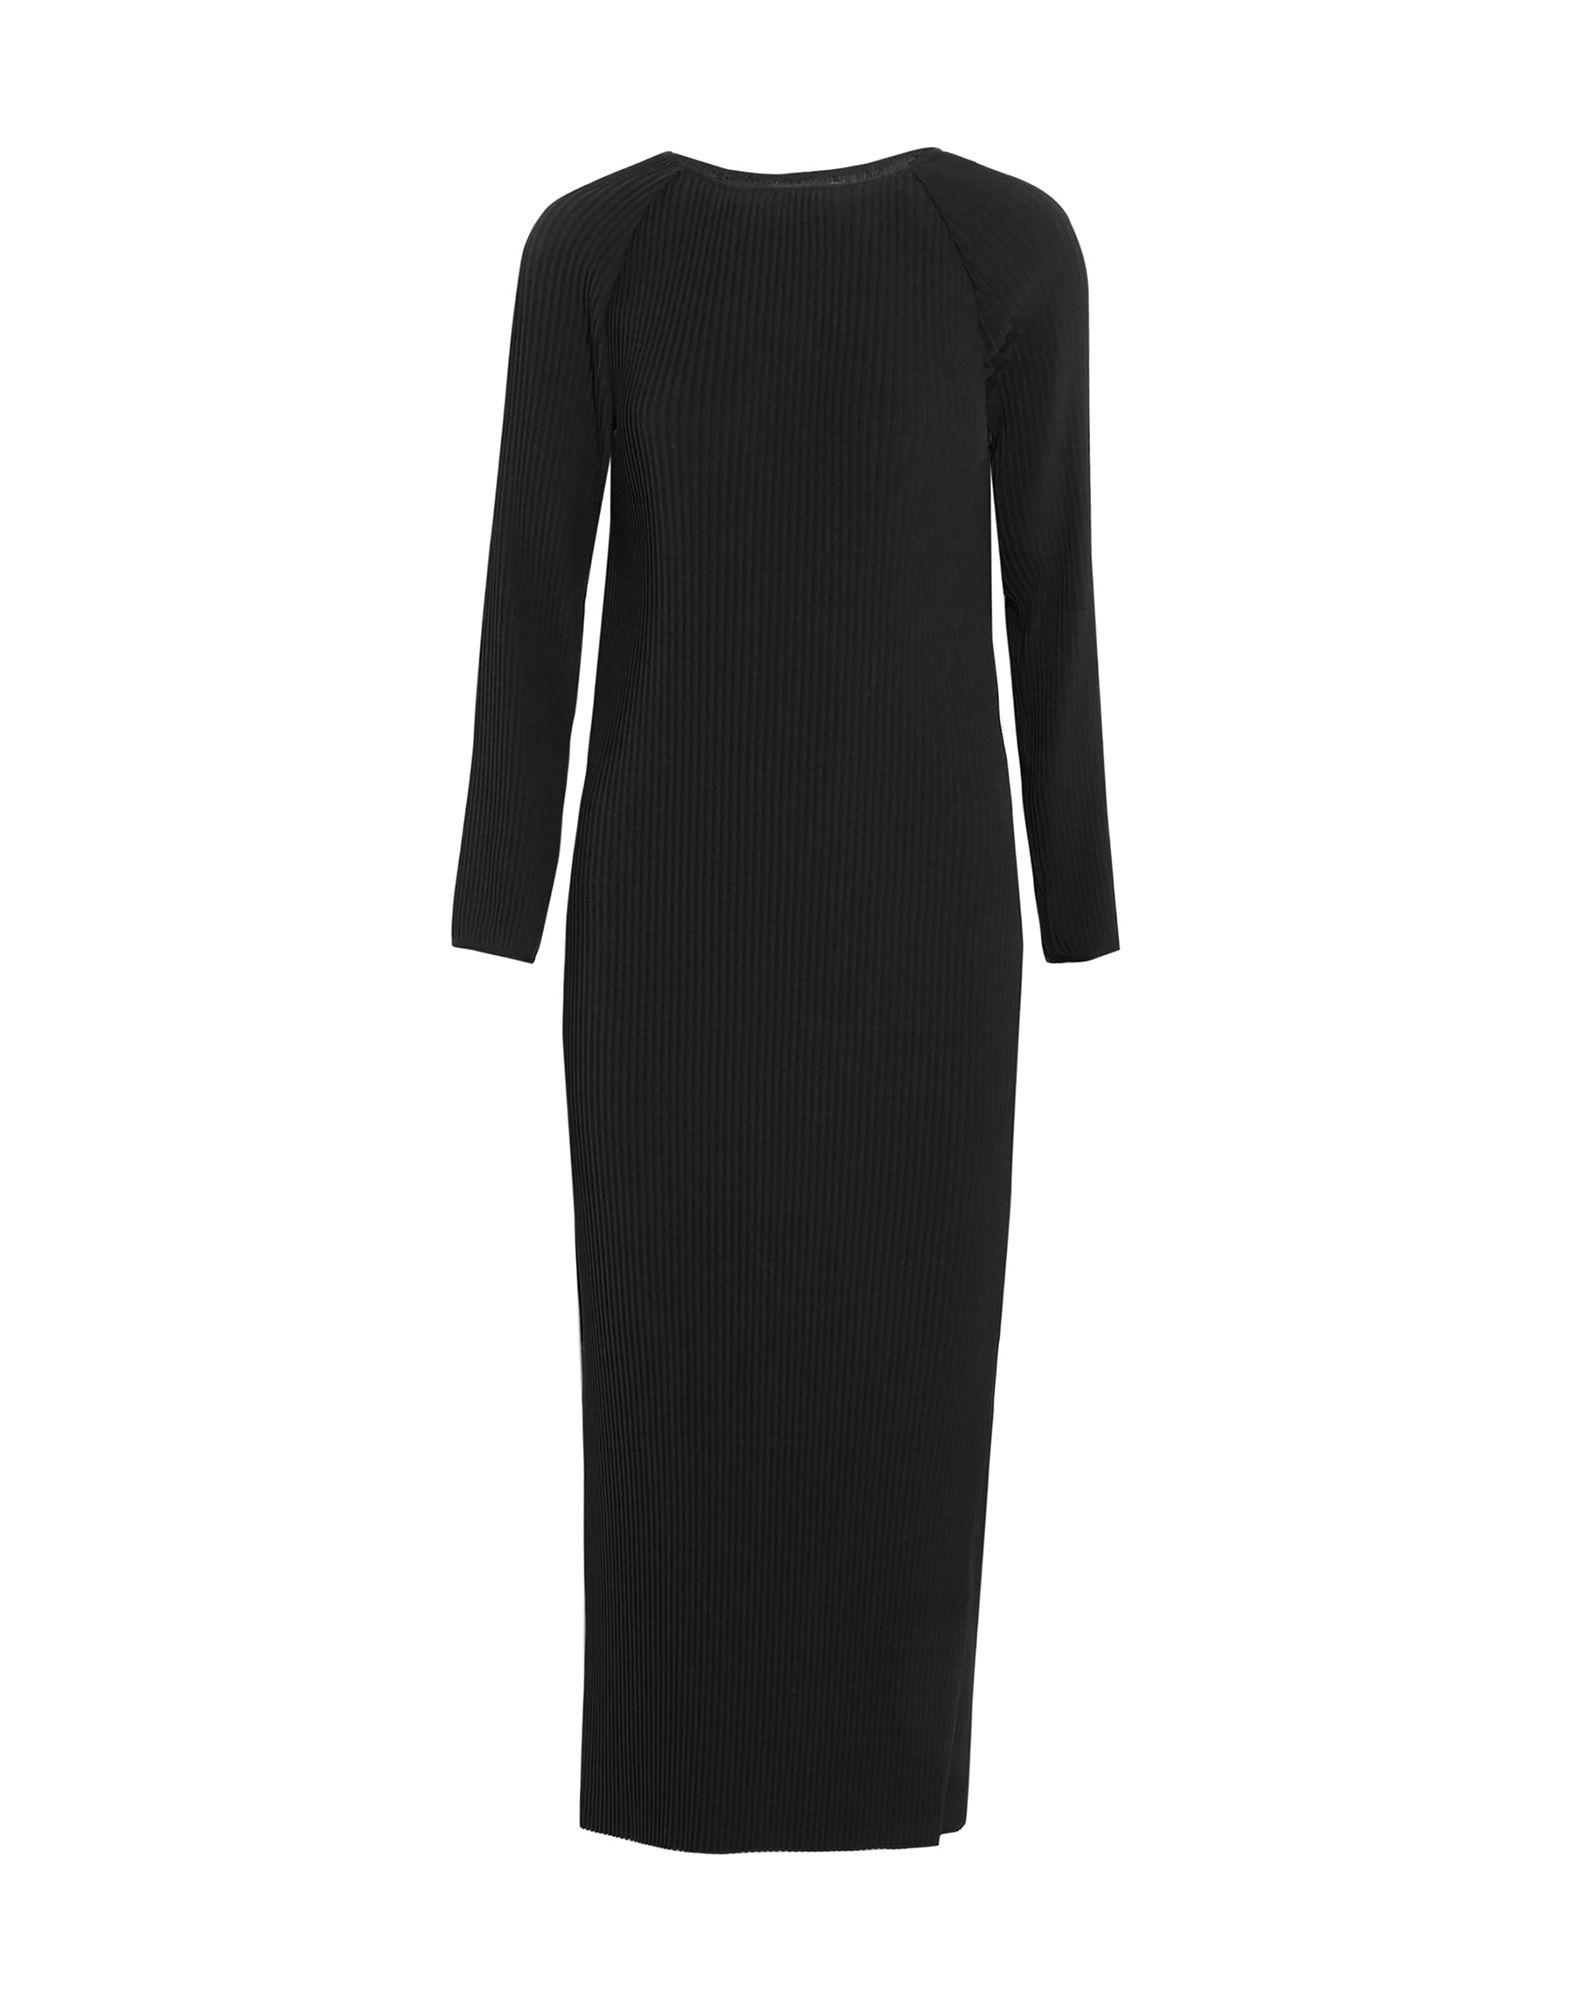 CASASOLA Long Dresses in Black